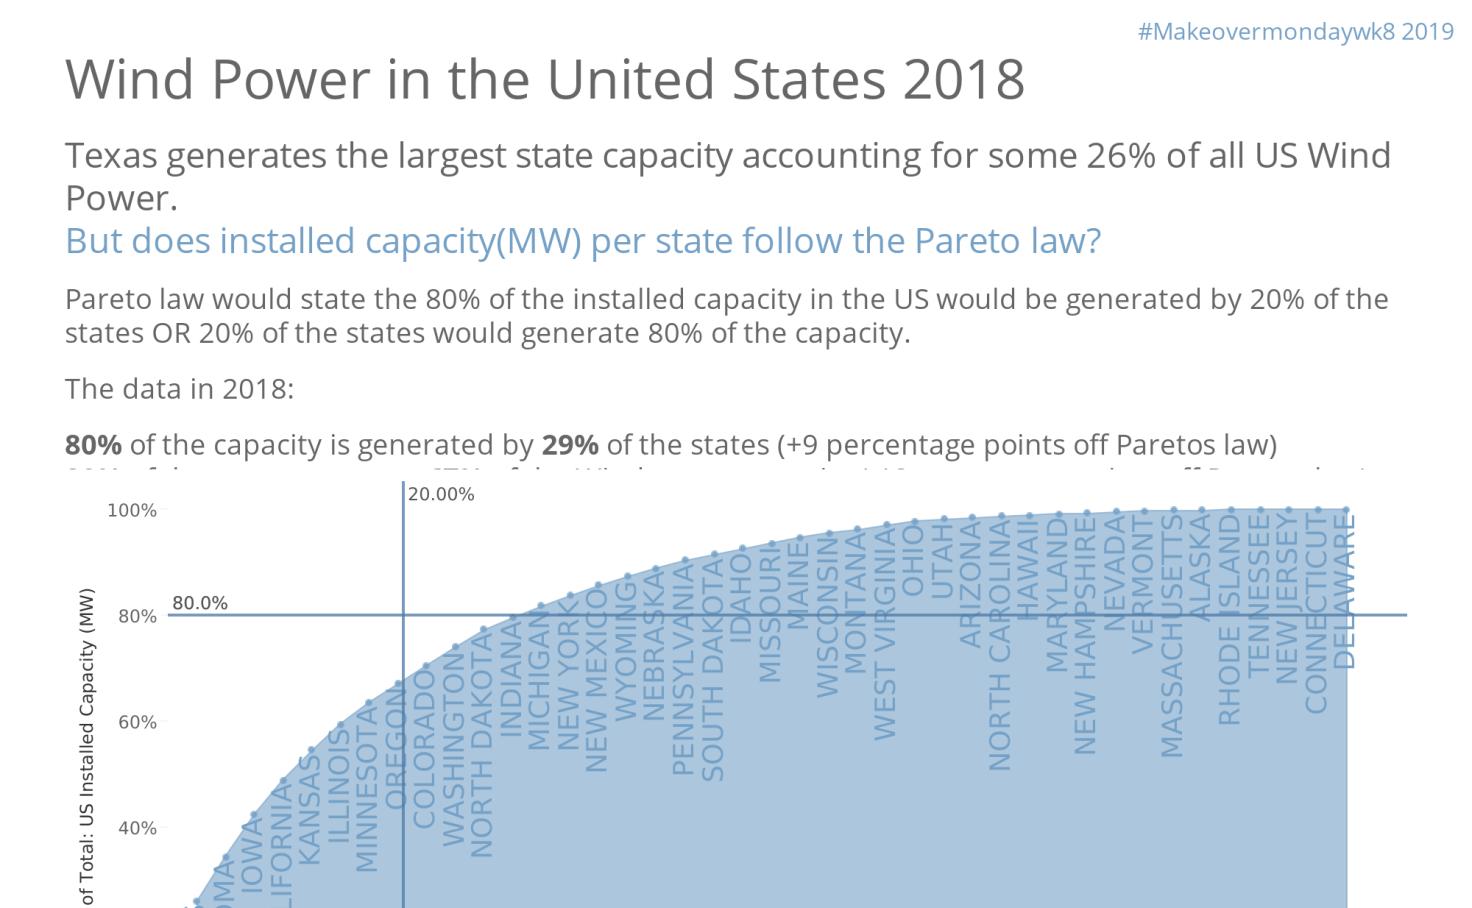 MOMwk8 2019_US wind power capacity mw - Adam Green | Tableau